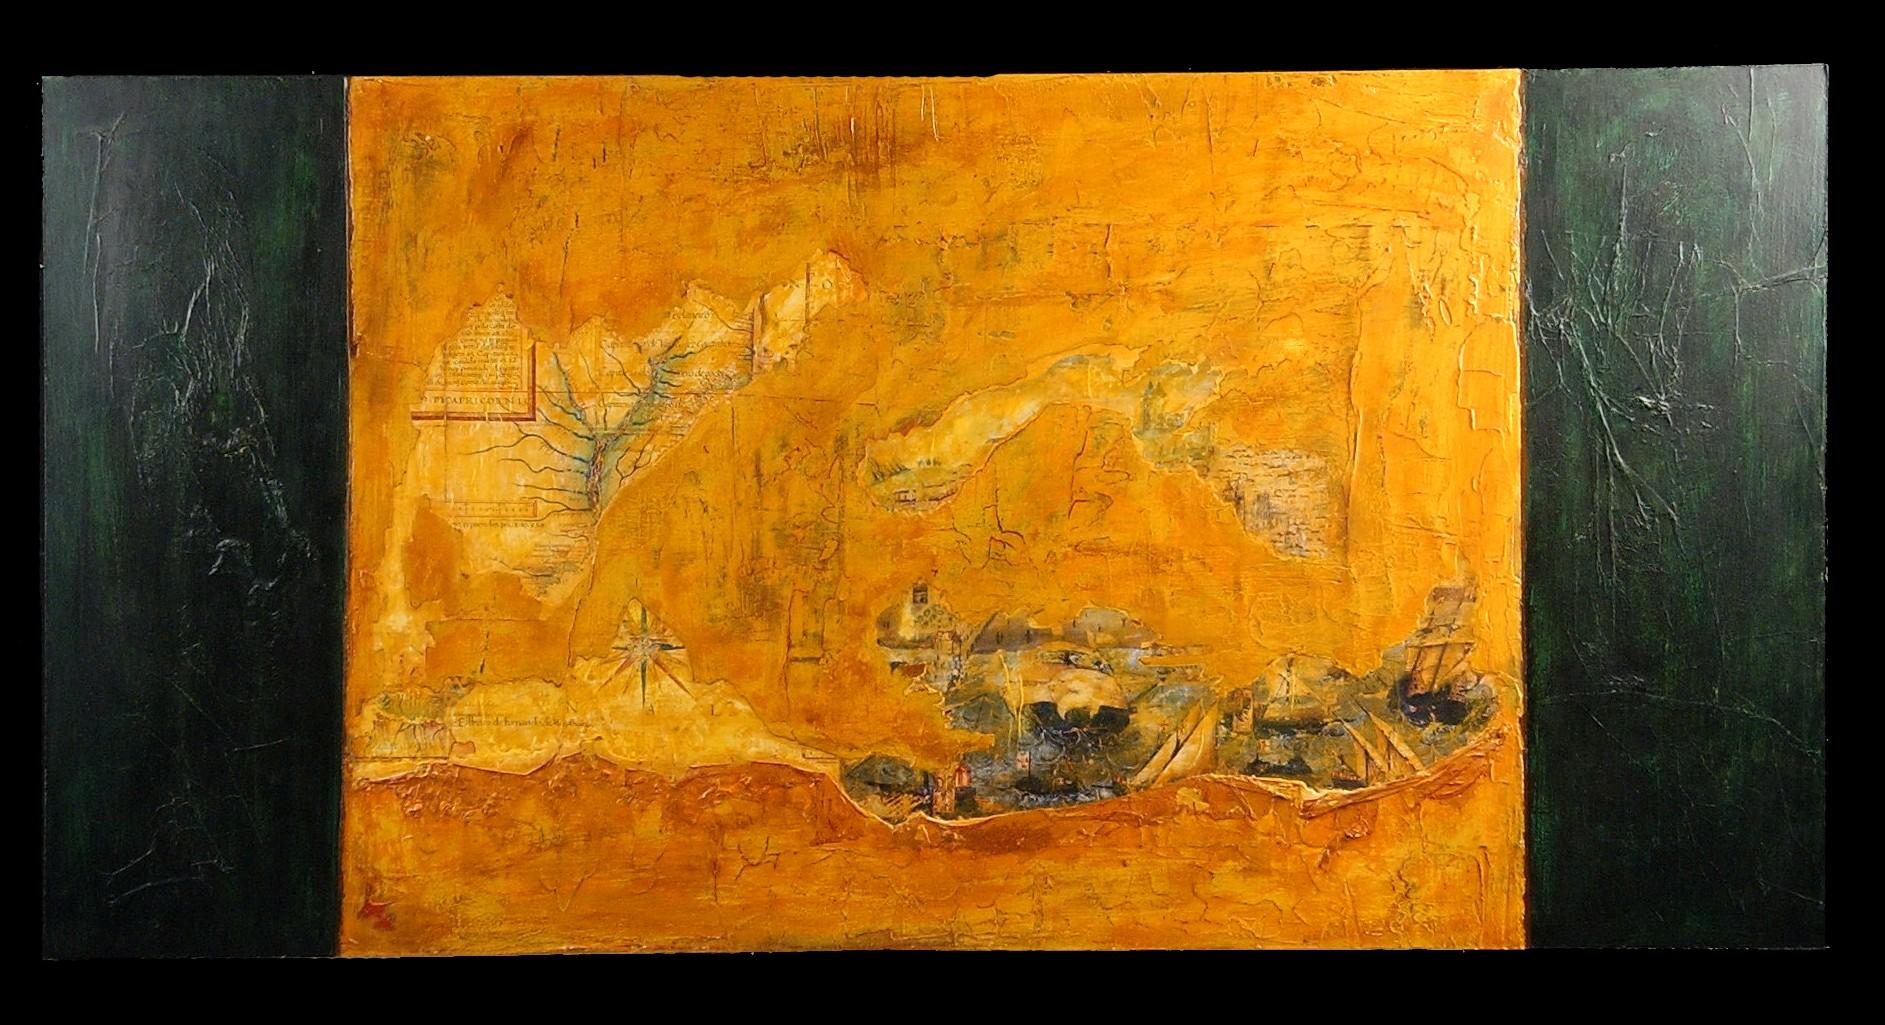 Three paintings from Whitewash